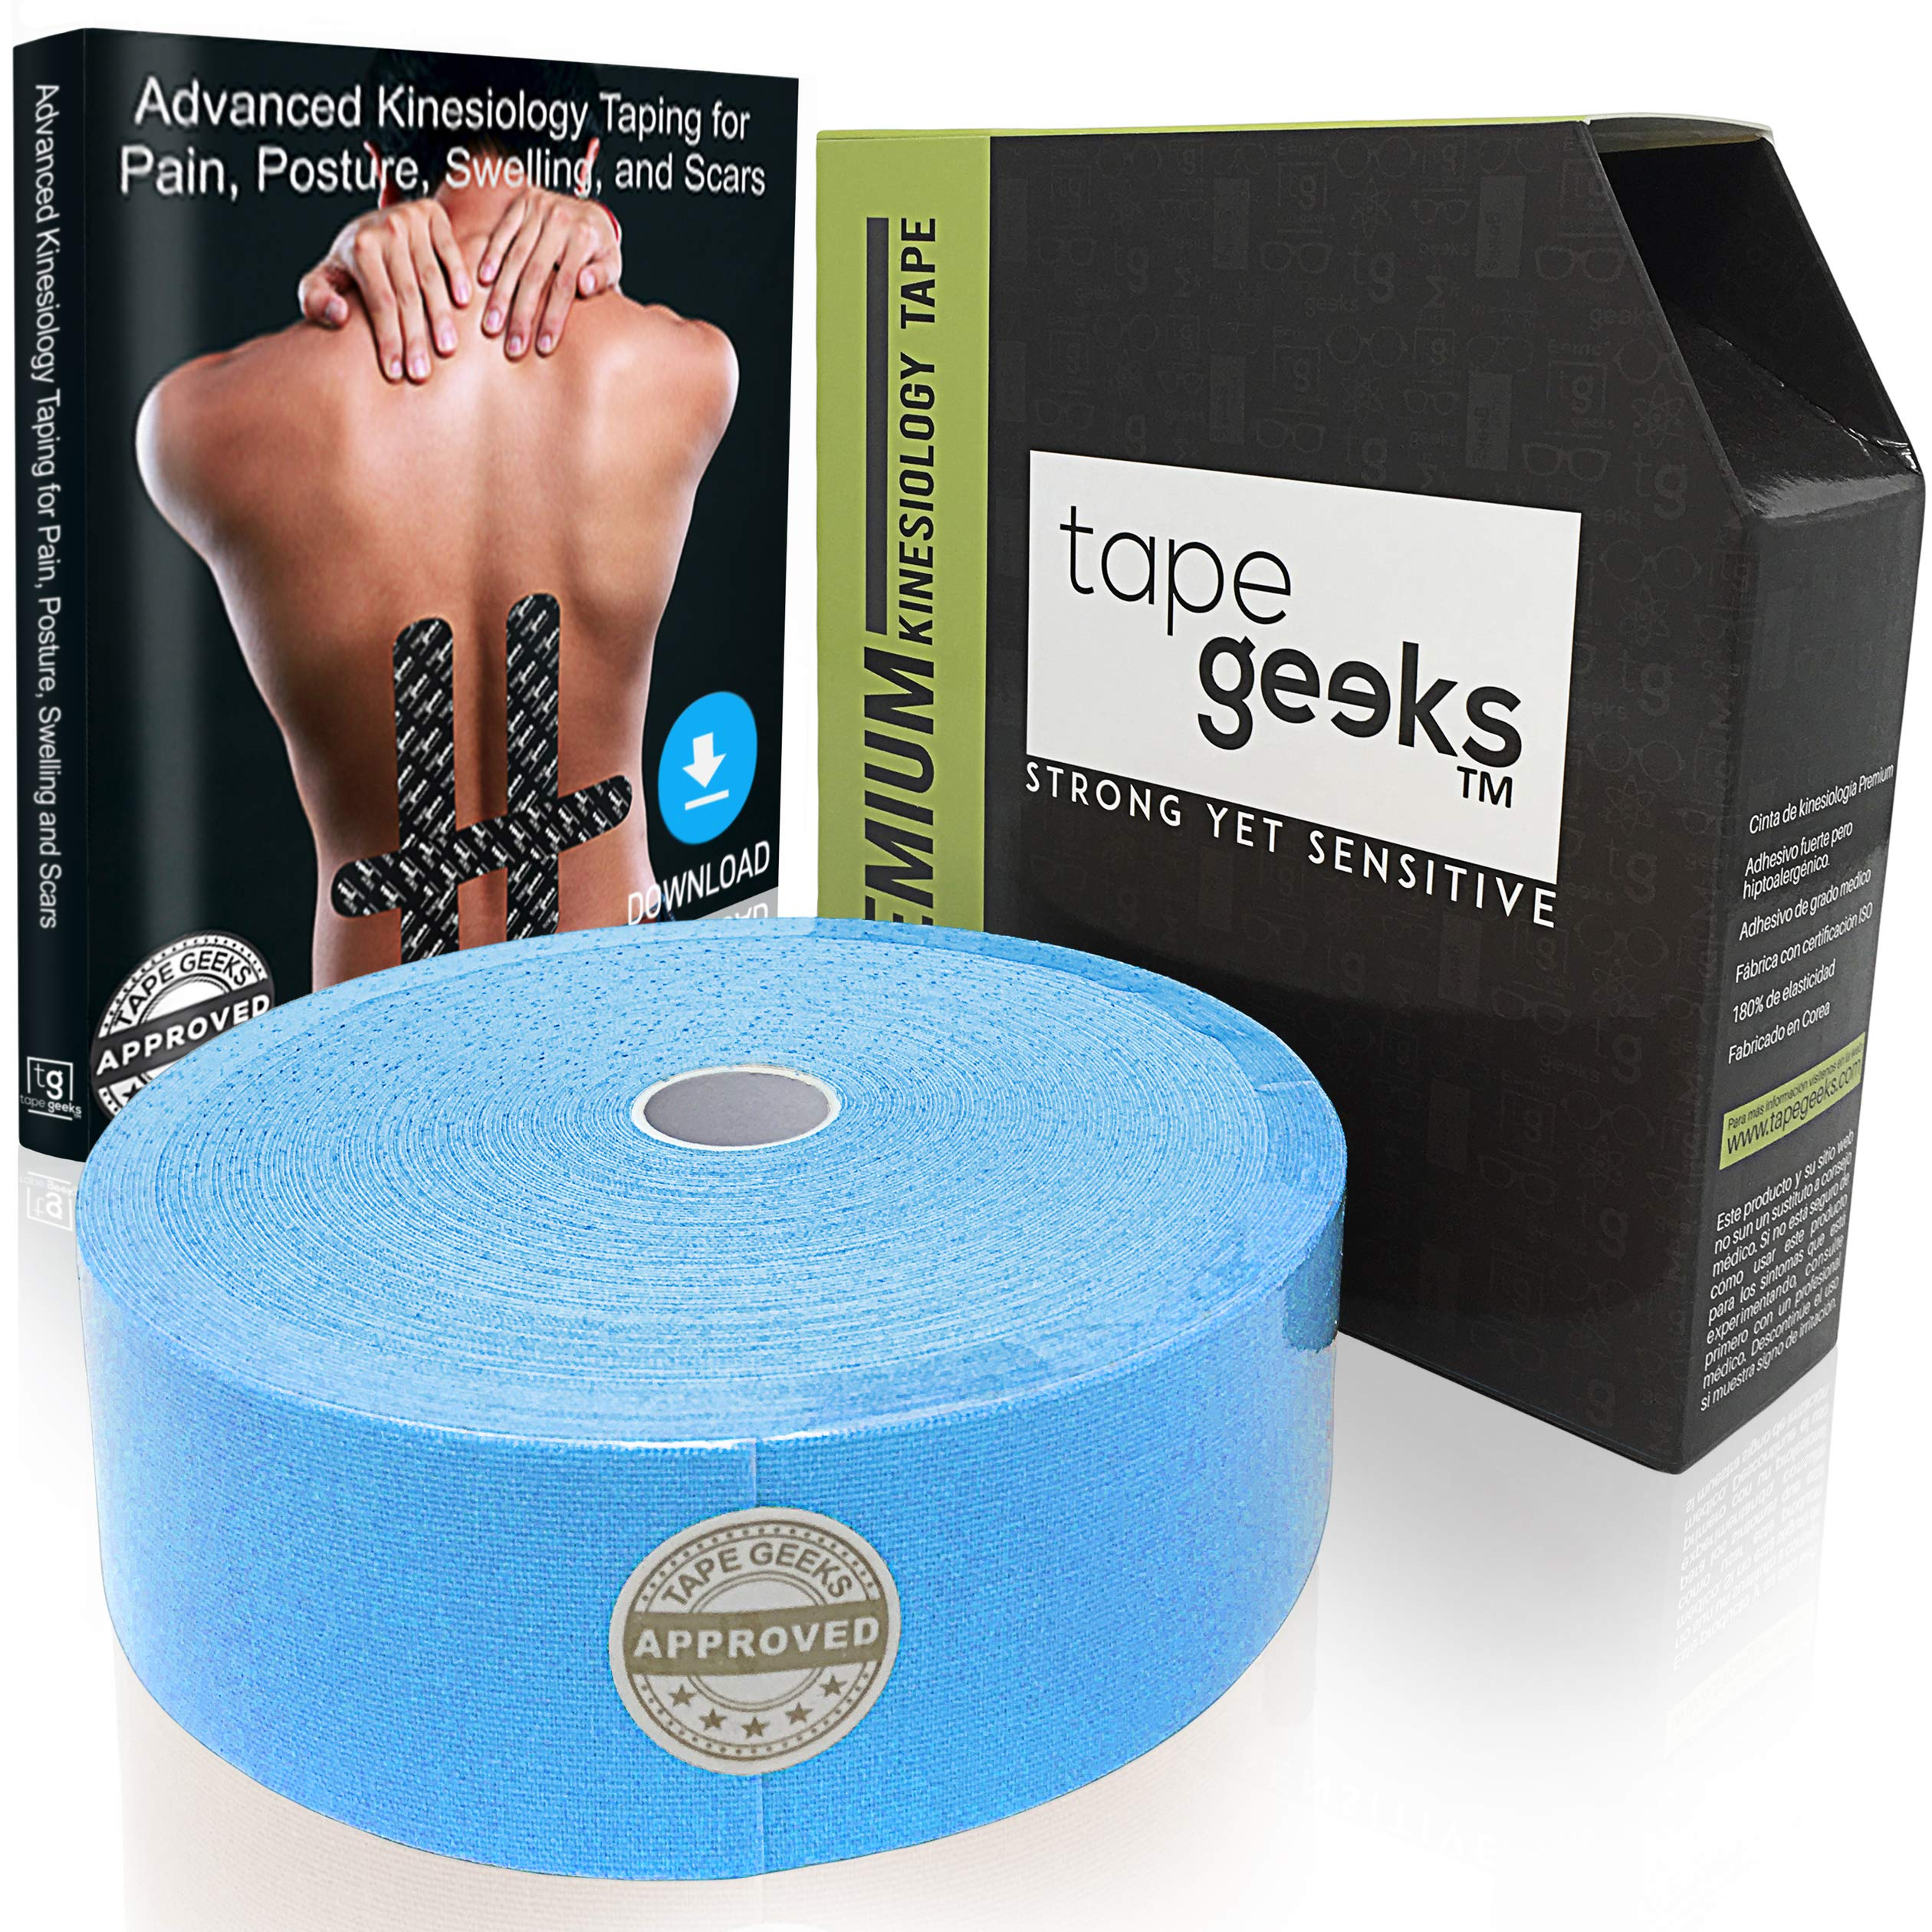 TapeGeeks Kinesiology Sports Tape (Blue, Bulk 2 inch x 115 feet)